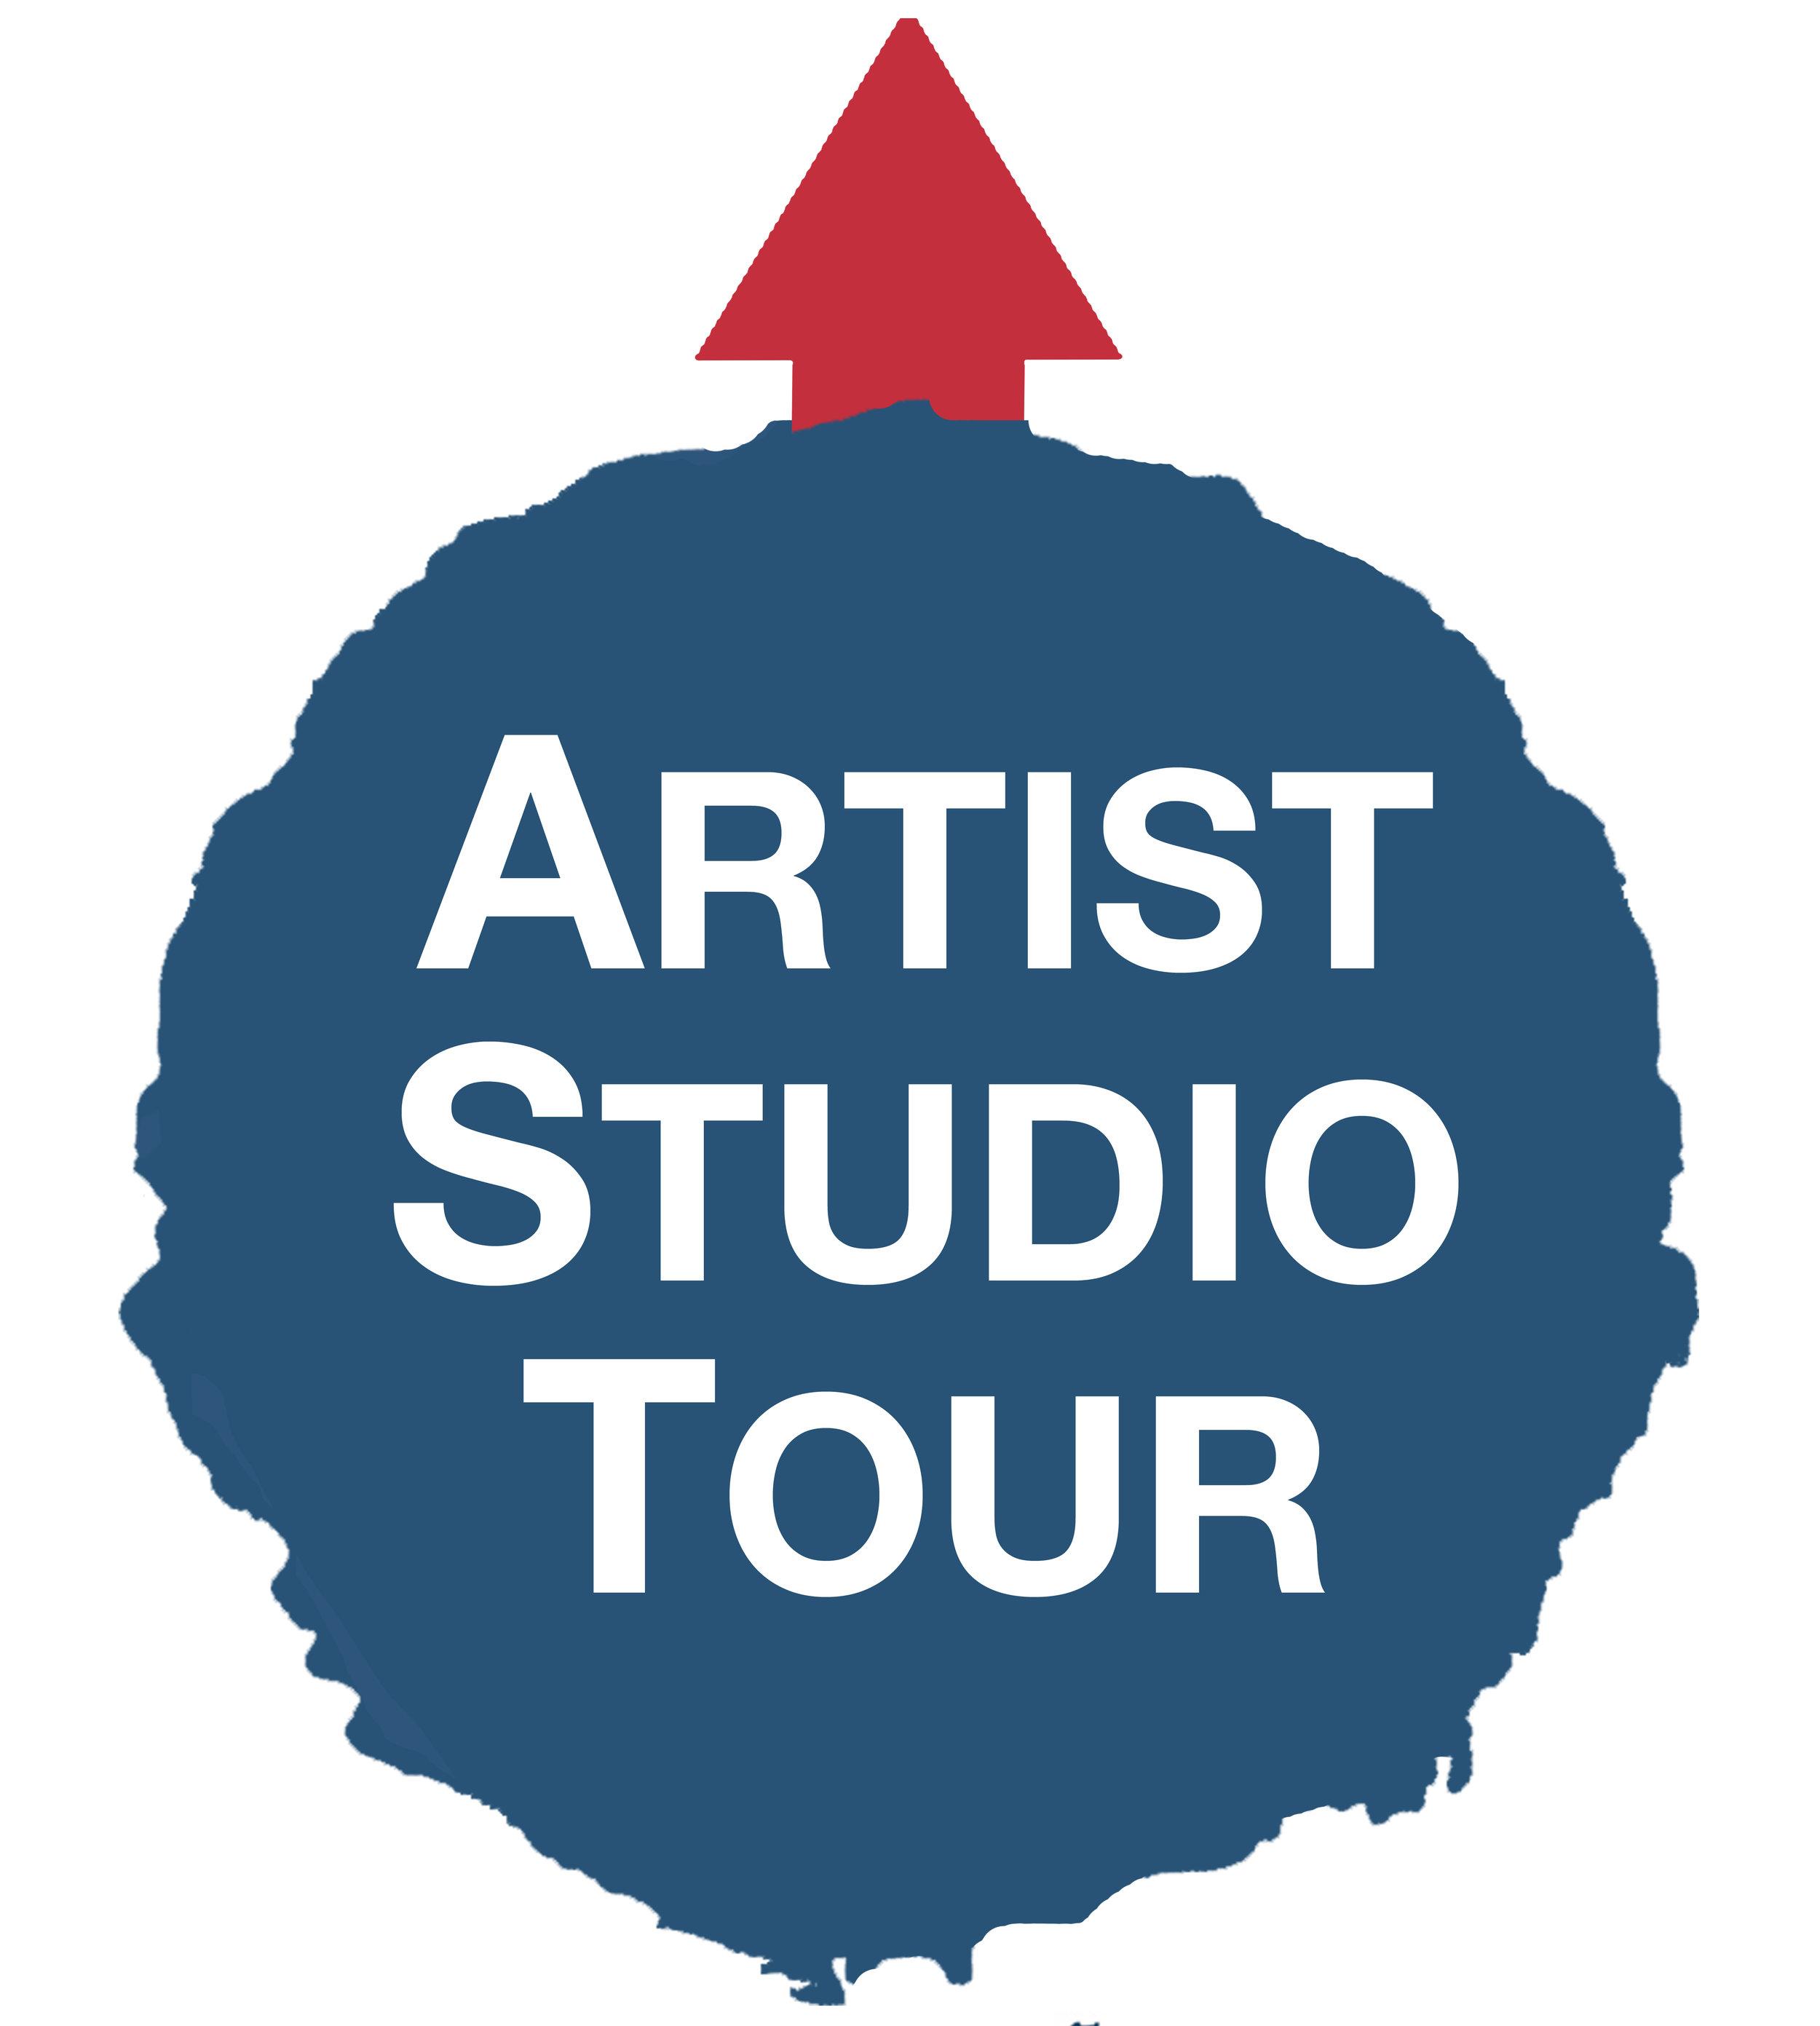 StudioTourHouseSign.jpg